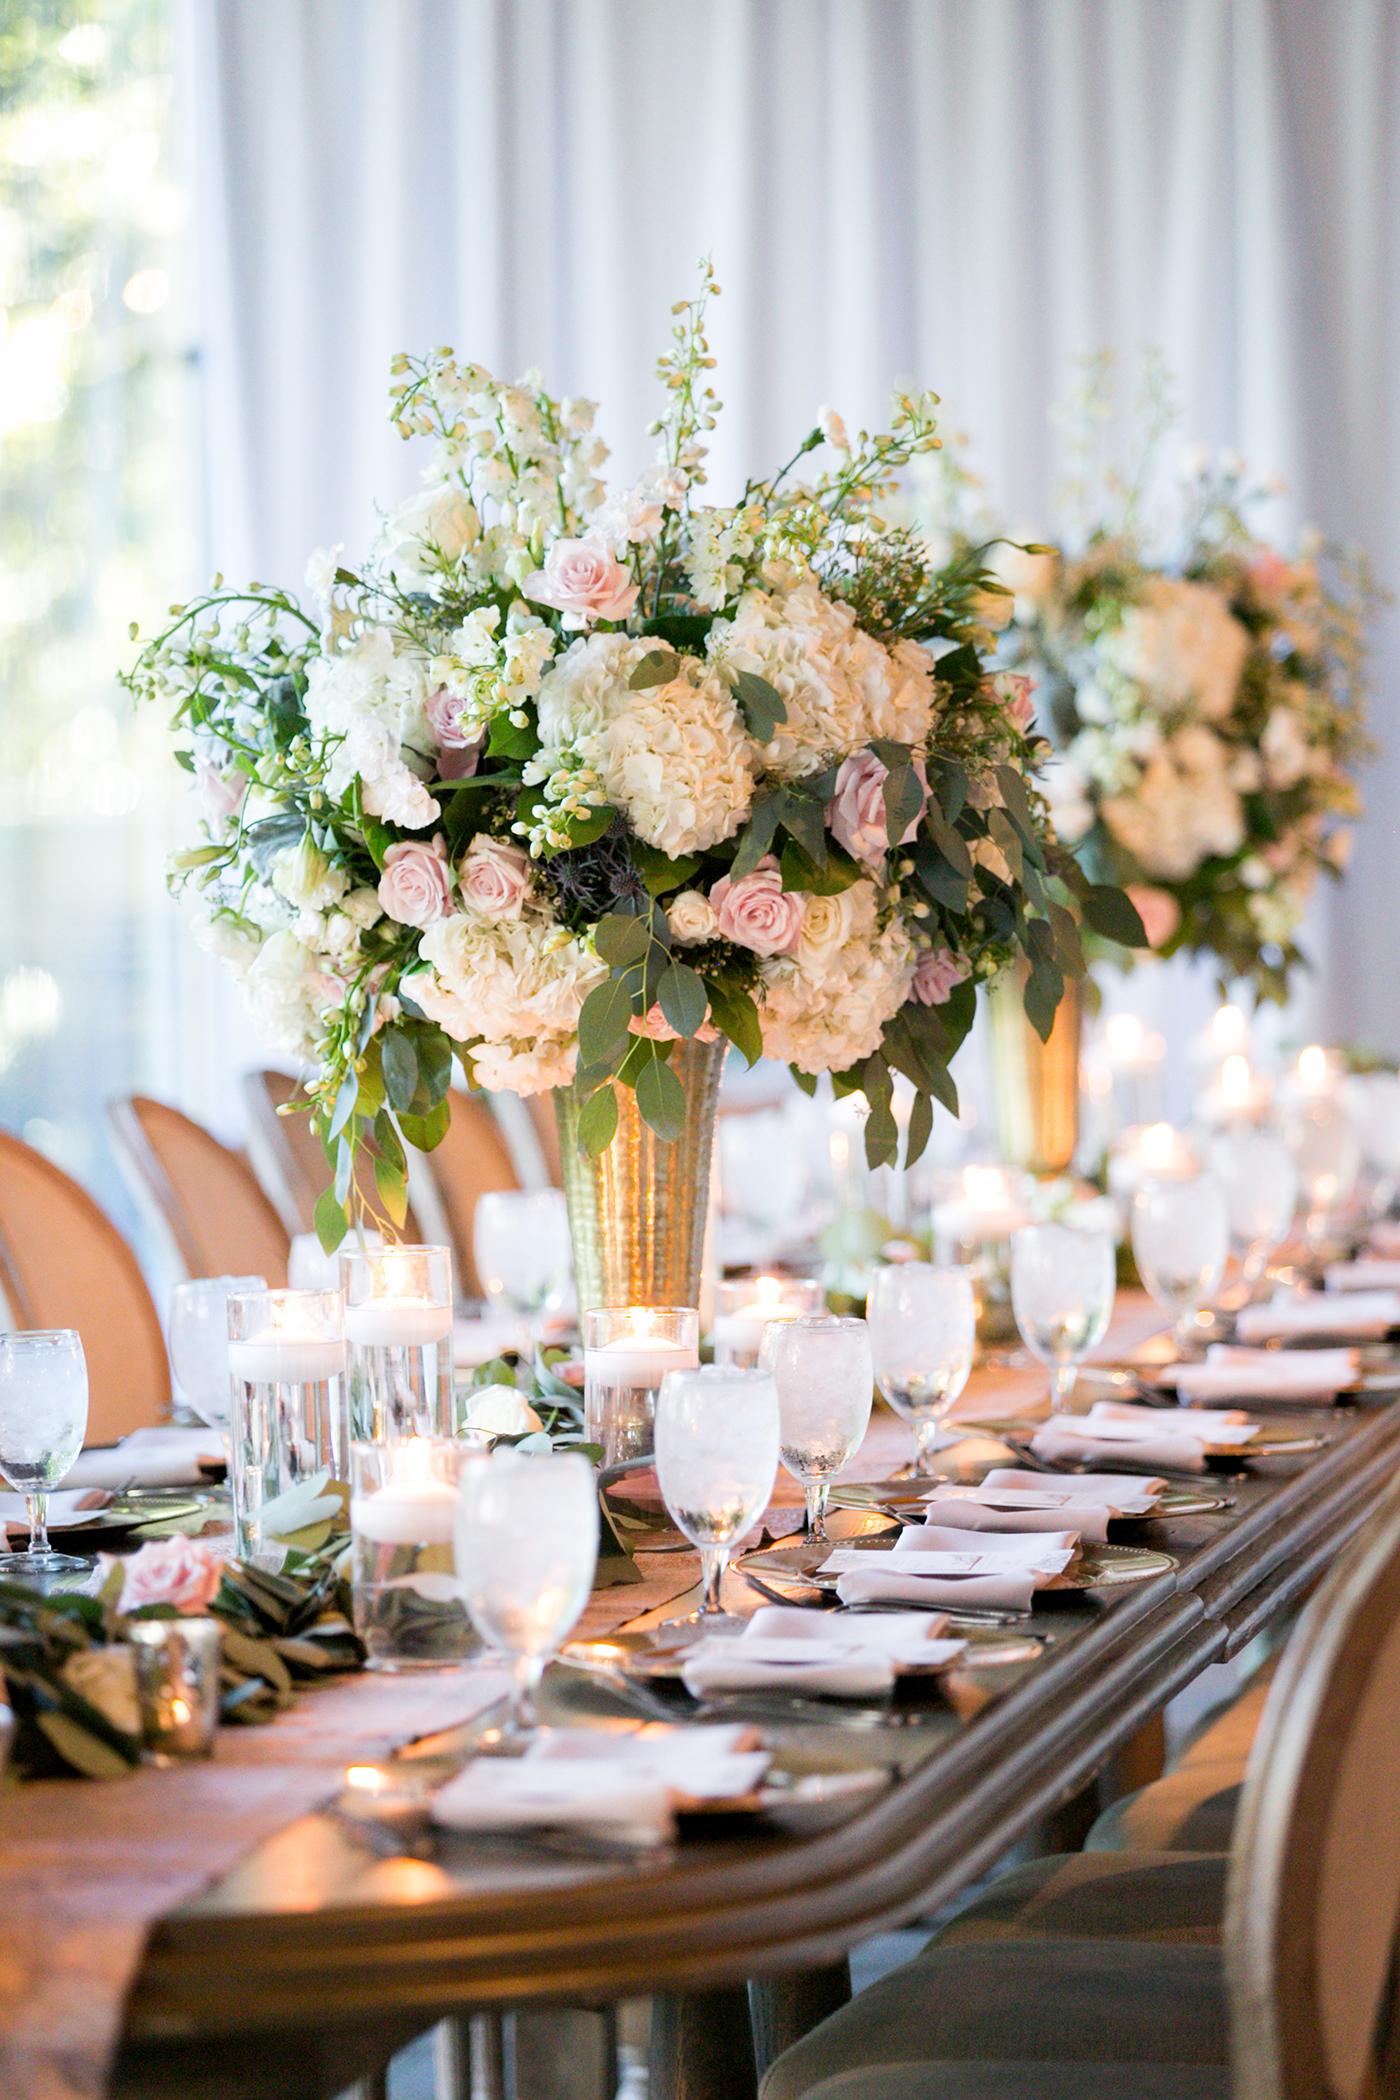 Wedding Planner Dallas TX - Allday Events - Highland Park - Marie Gabrielle Wedding - 52.jpg